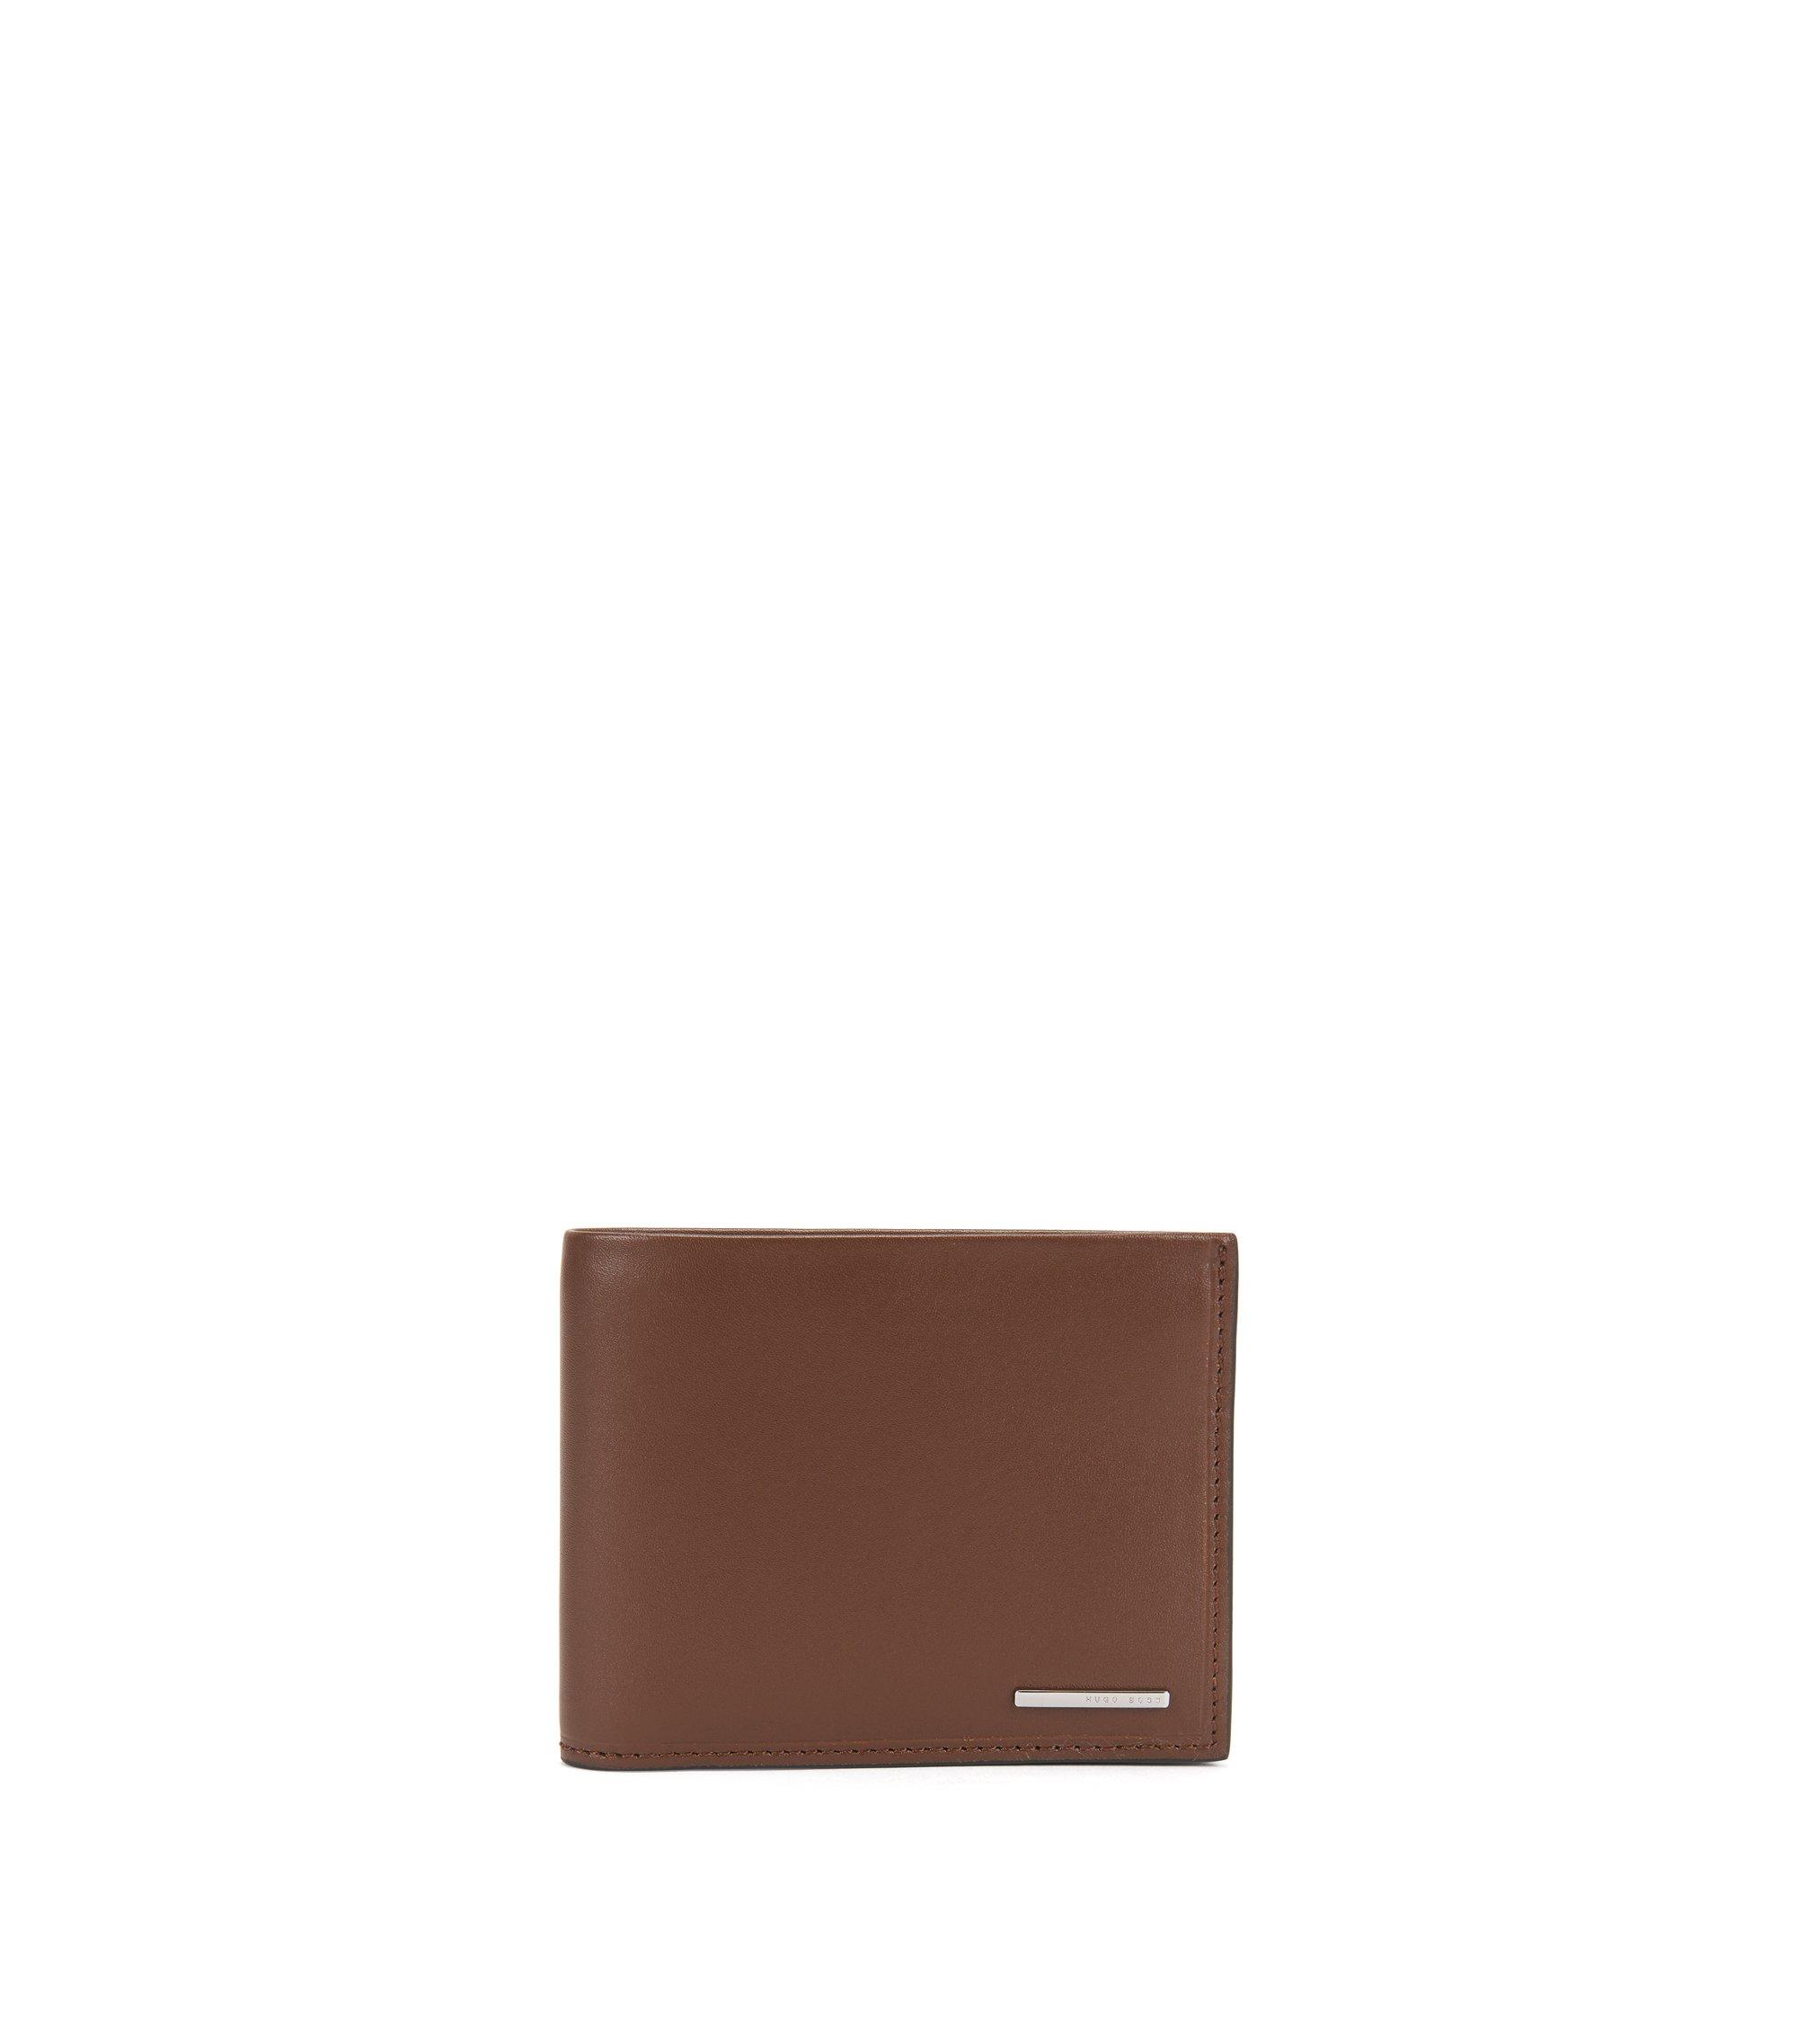 Leather Billfold Wallet | Ruben , Light Brown